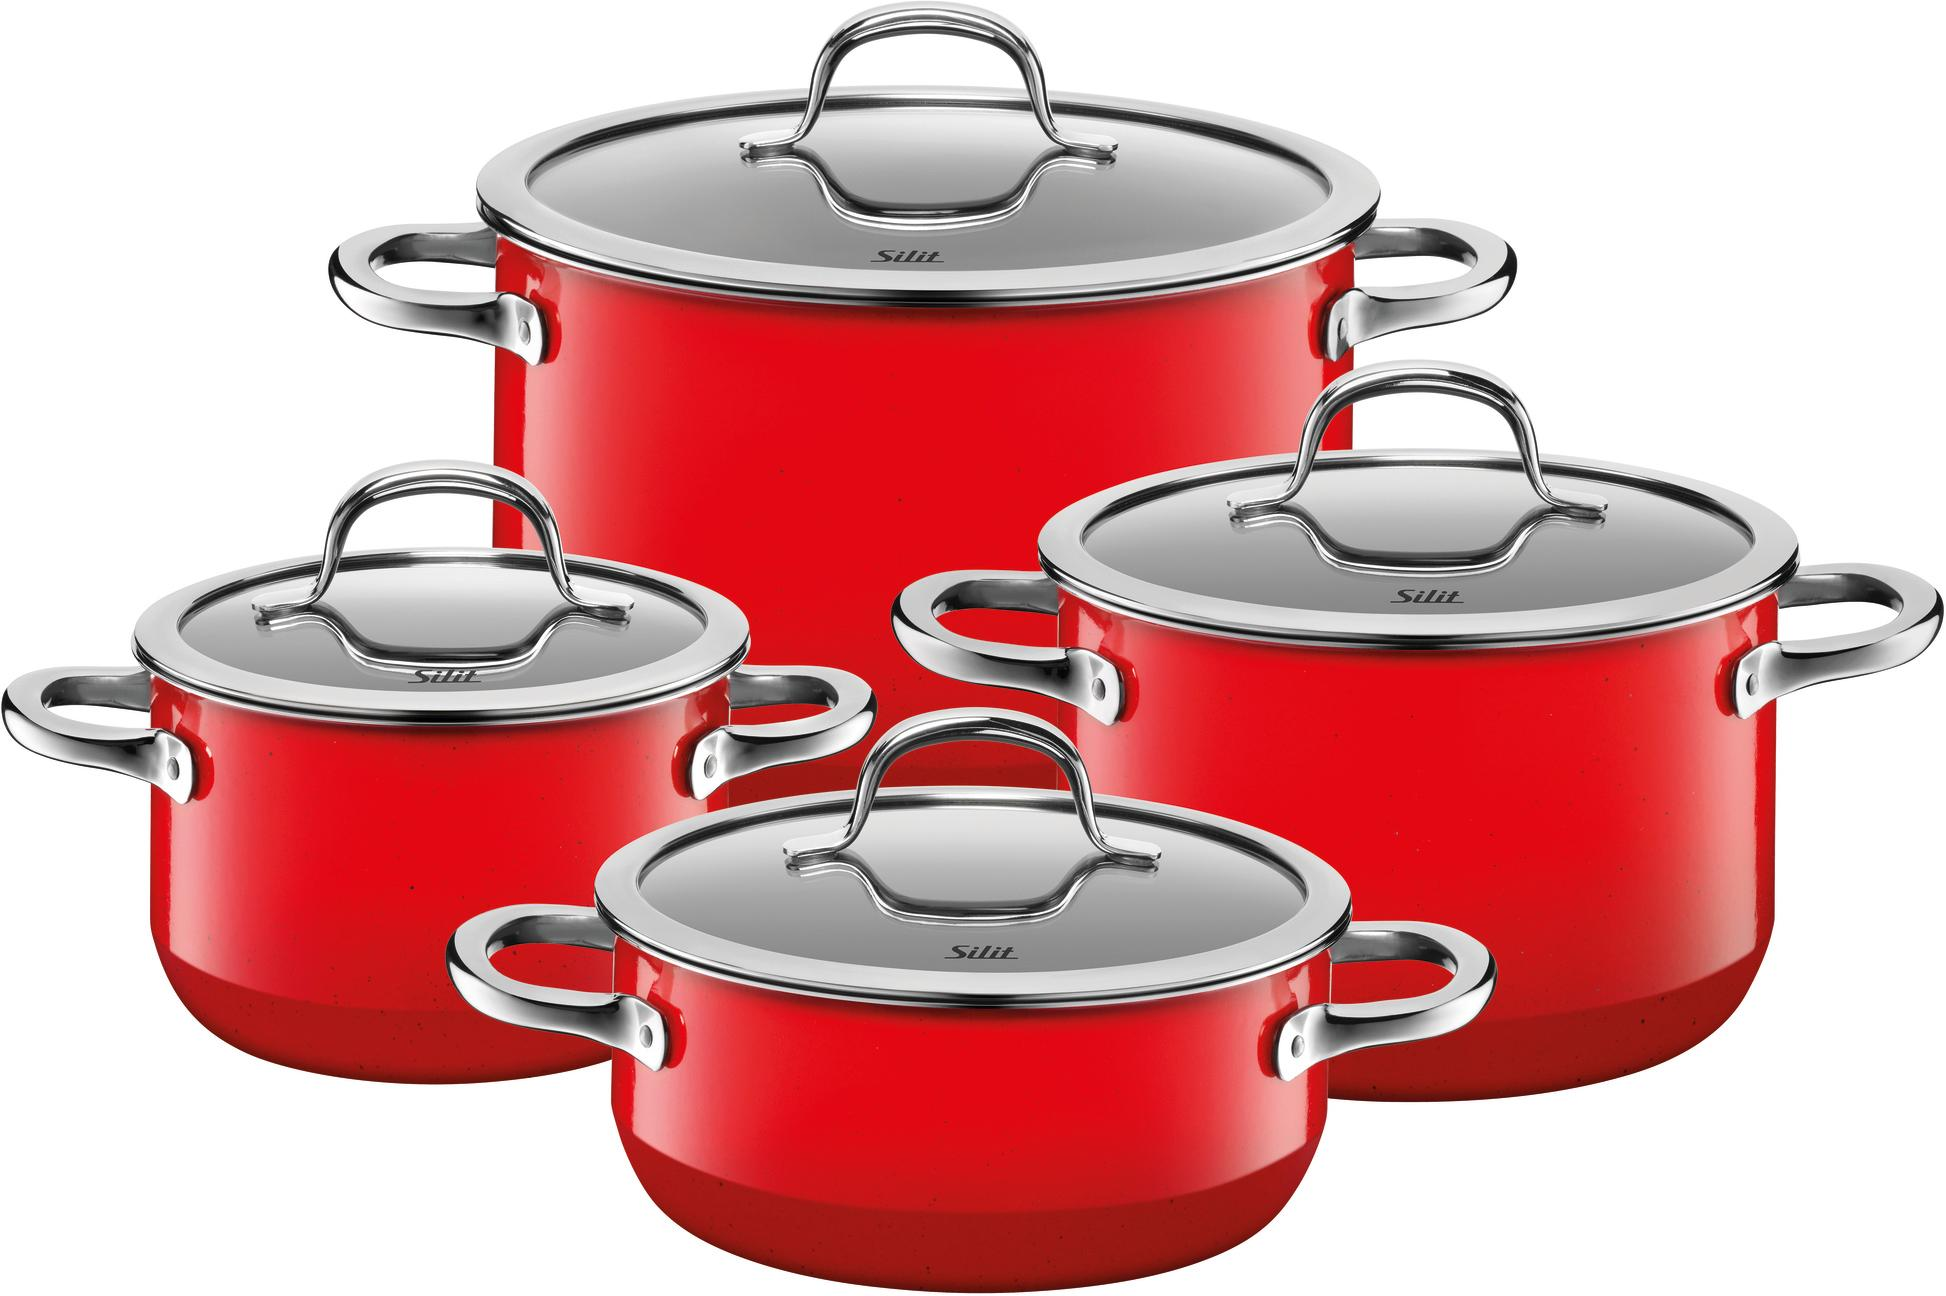 Silit Topf-Set Passion Red, Silargan, (Set, 8 tlg.), Induktion, Glasdeckel rot Topfsets Töpfe Haushaltswaren Topf